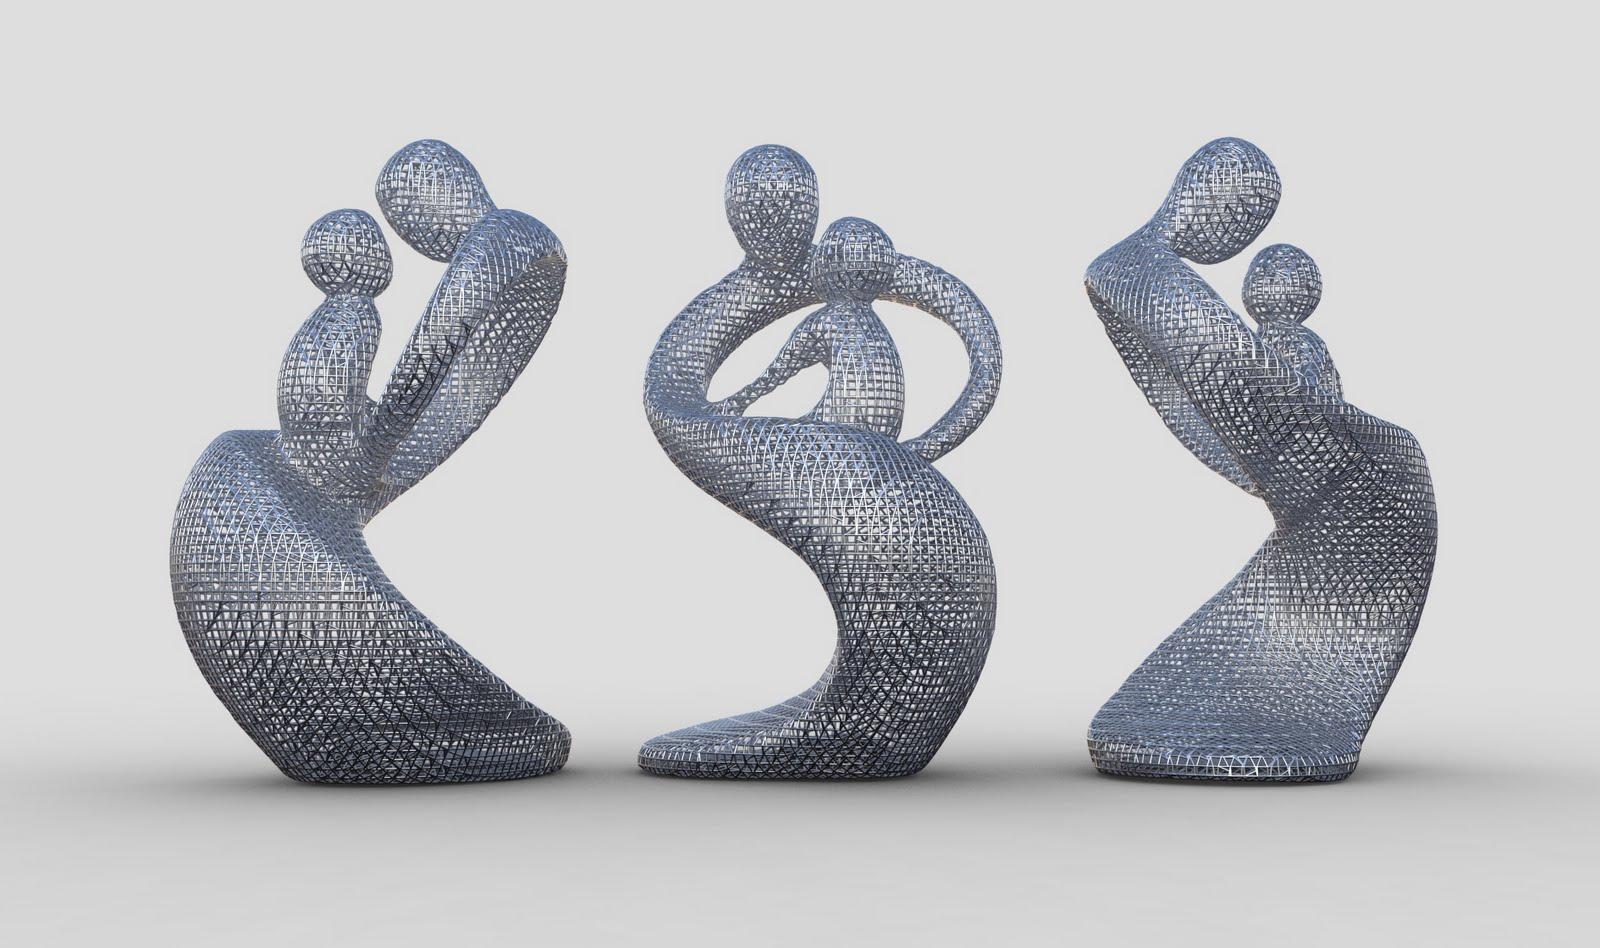 3d Laser Scanning: 3d Sculpture - Lattice Modifier - Render